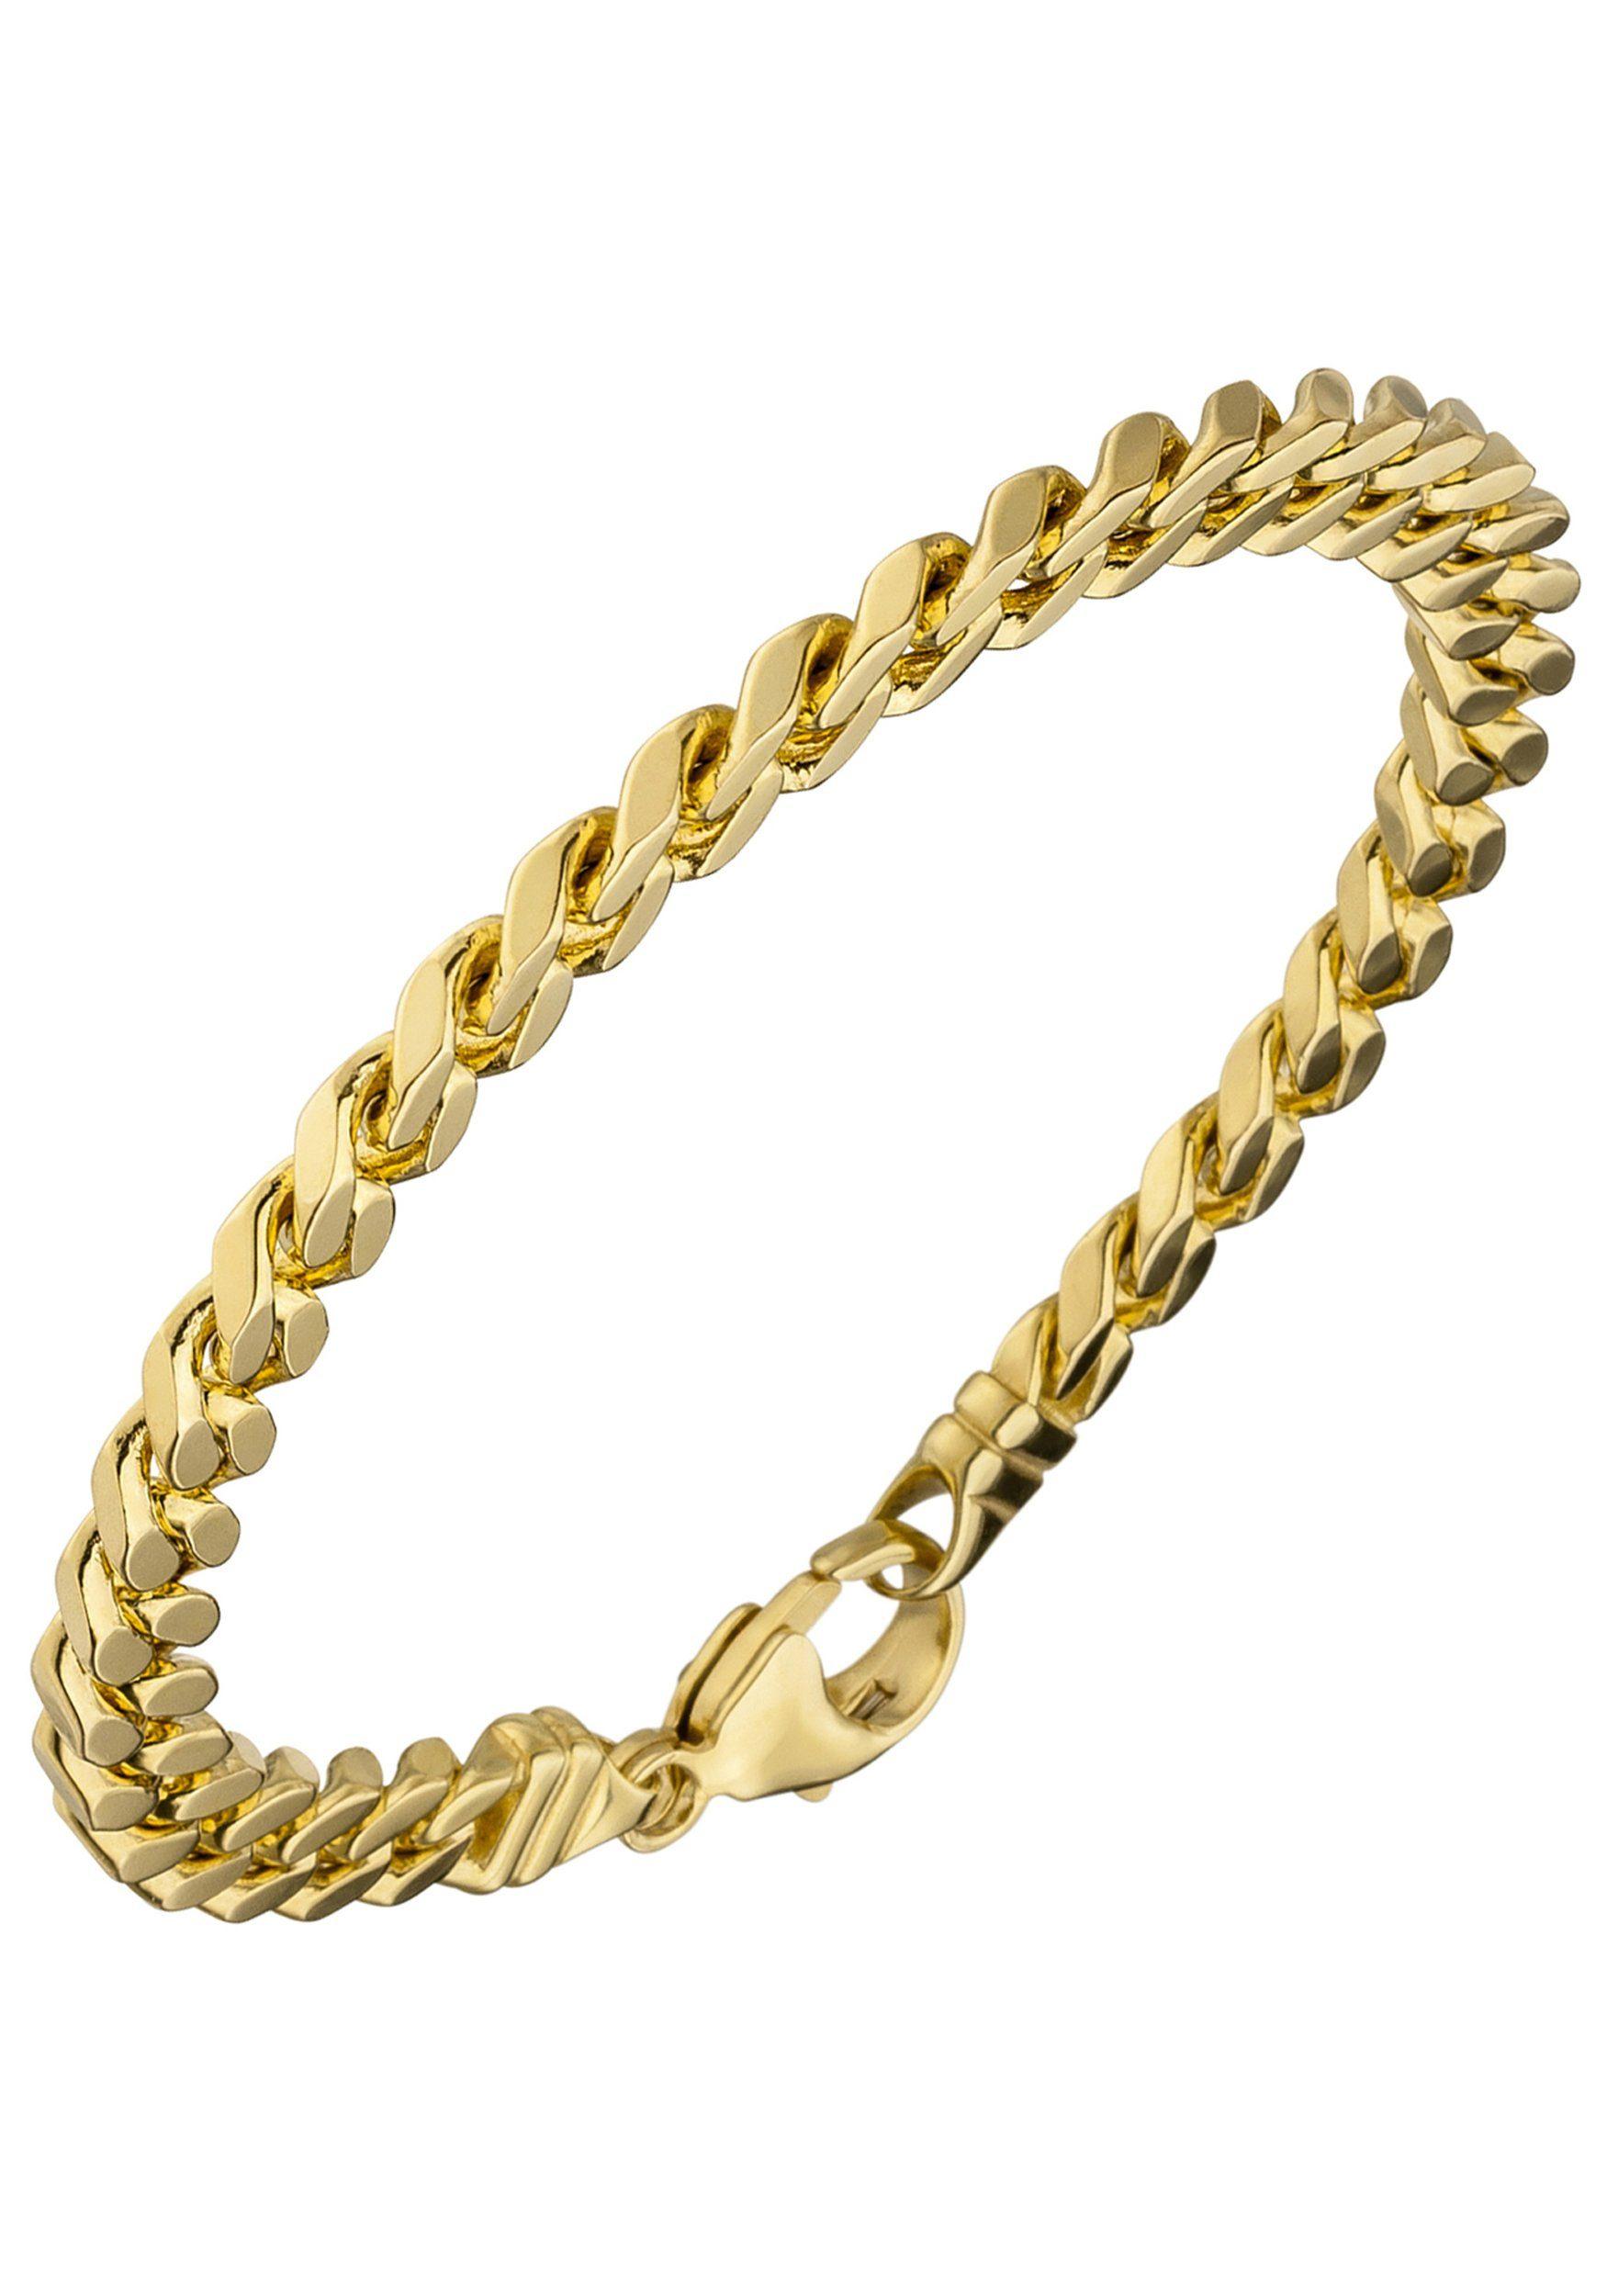 JOBO Goldarmband Panzerarmband 585 Gold massiv 19 cm